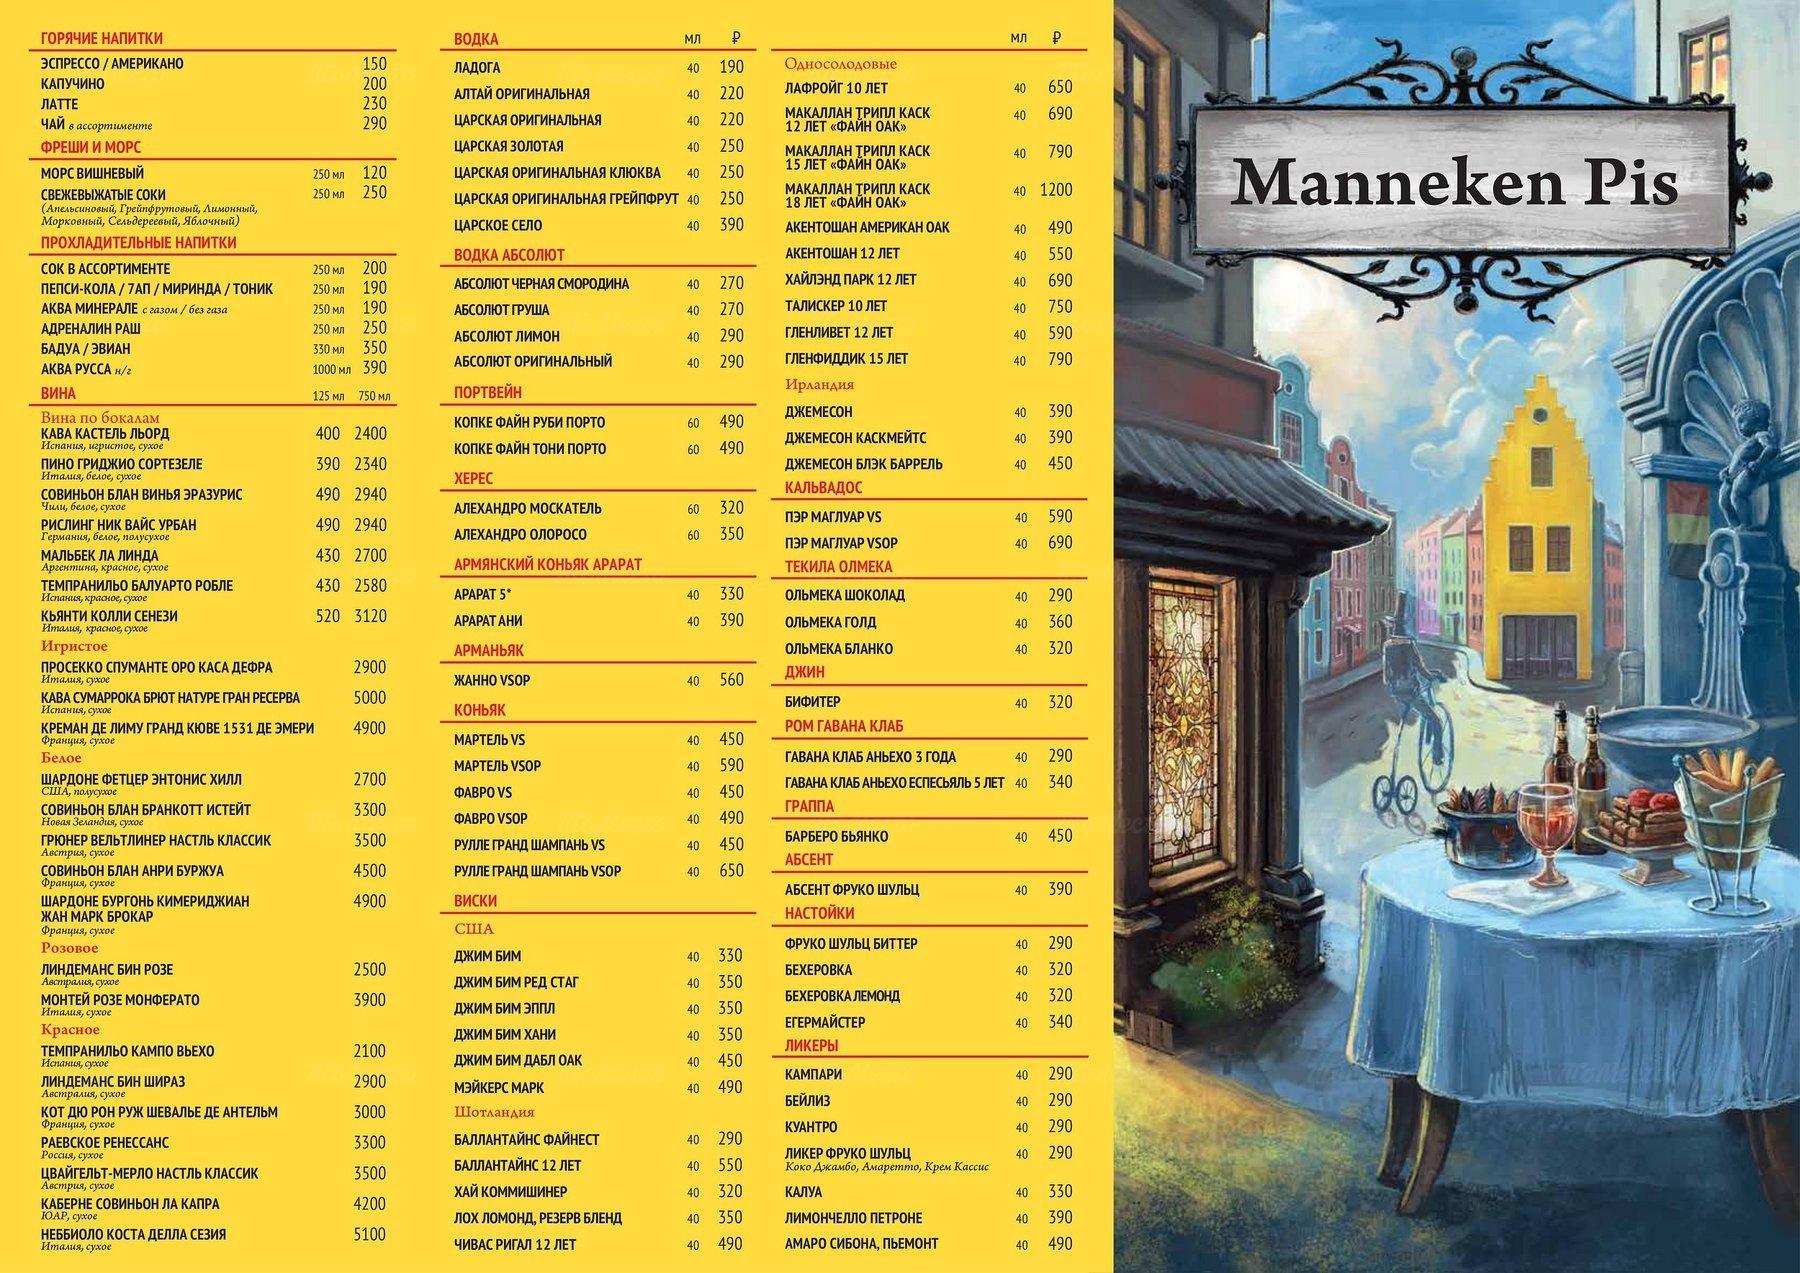 Меню паба Manneken Pis (Маннекен Пис) на Петровке фото 2